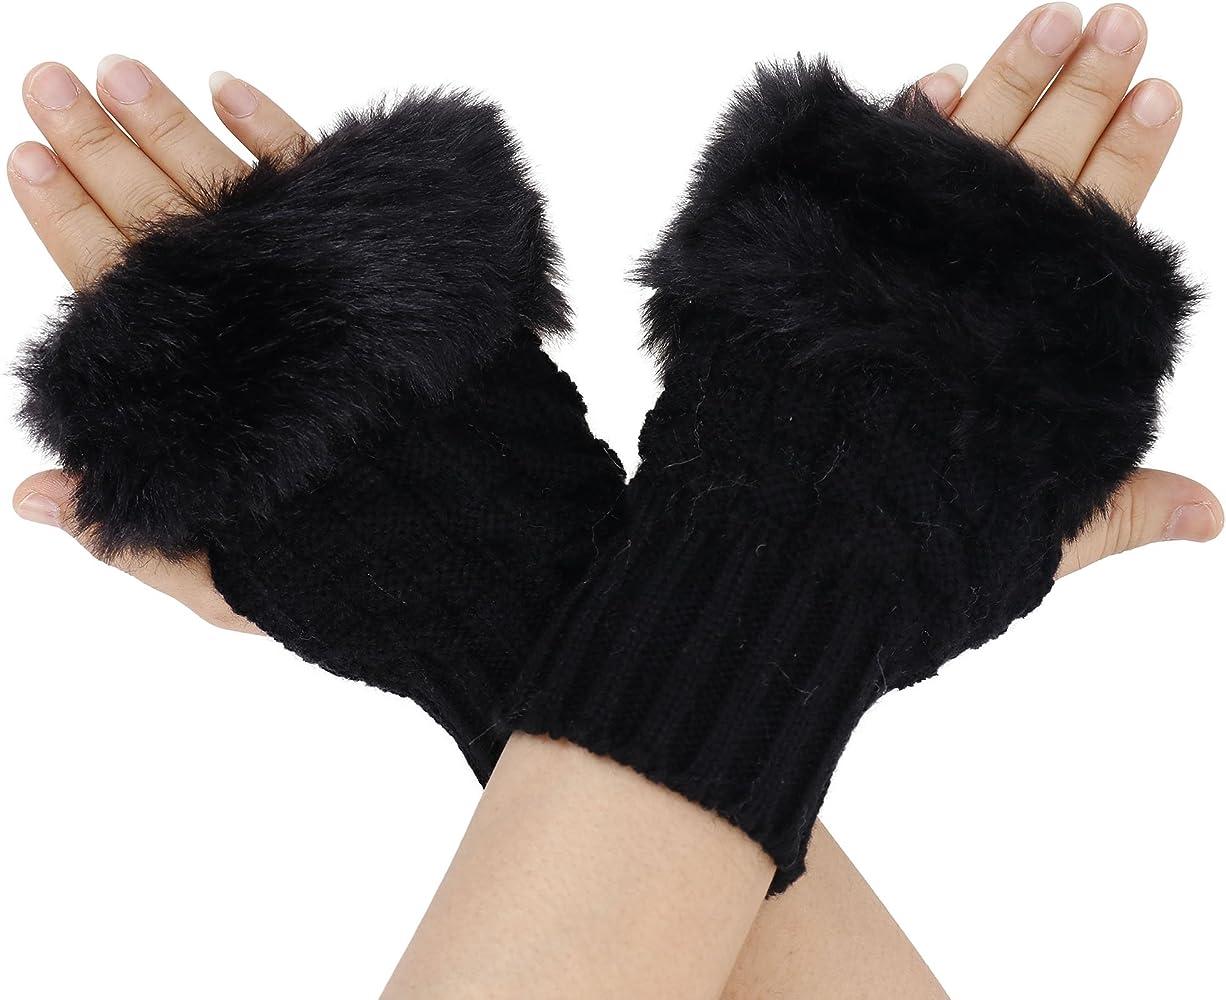 Ladies Fingerless Faux Fur Fluffy Winter Warmer Wrist Arm Knitted Mitten Gloves